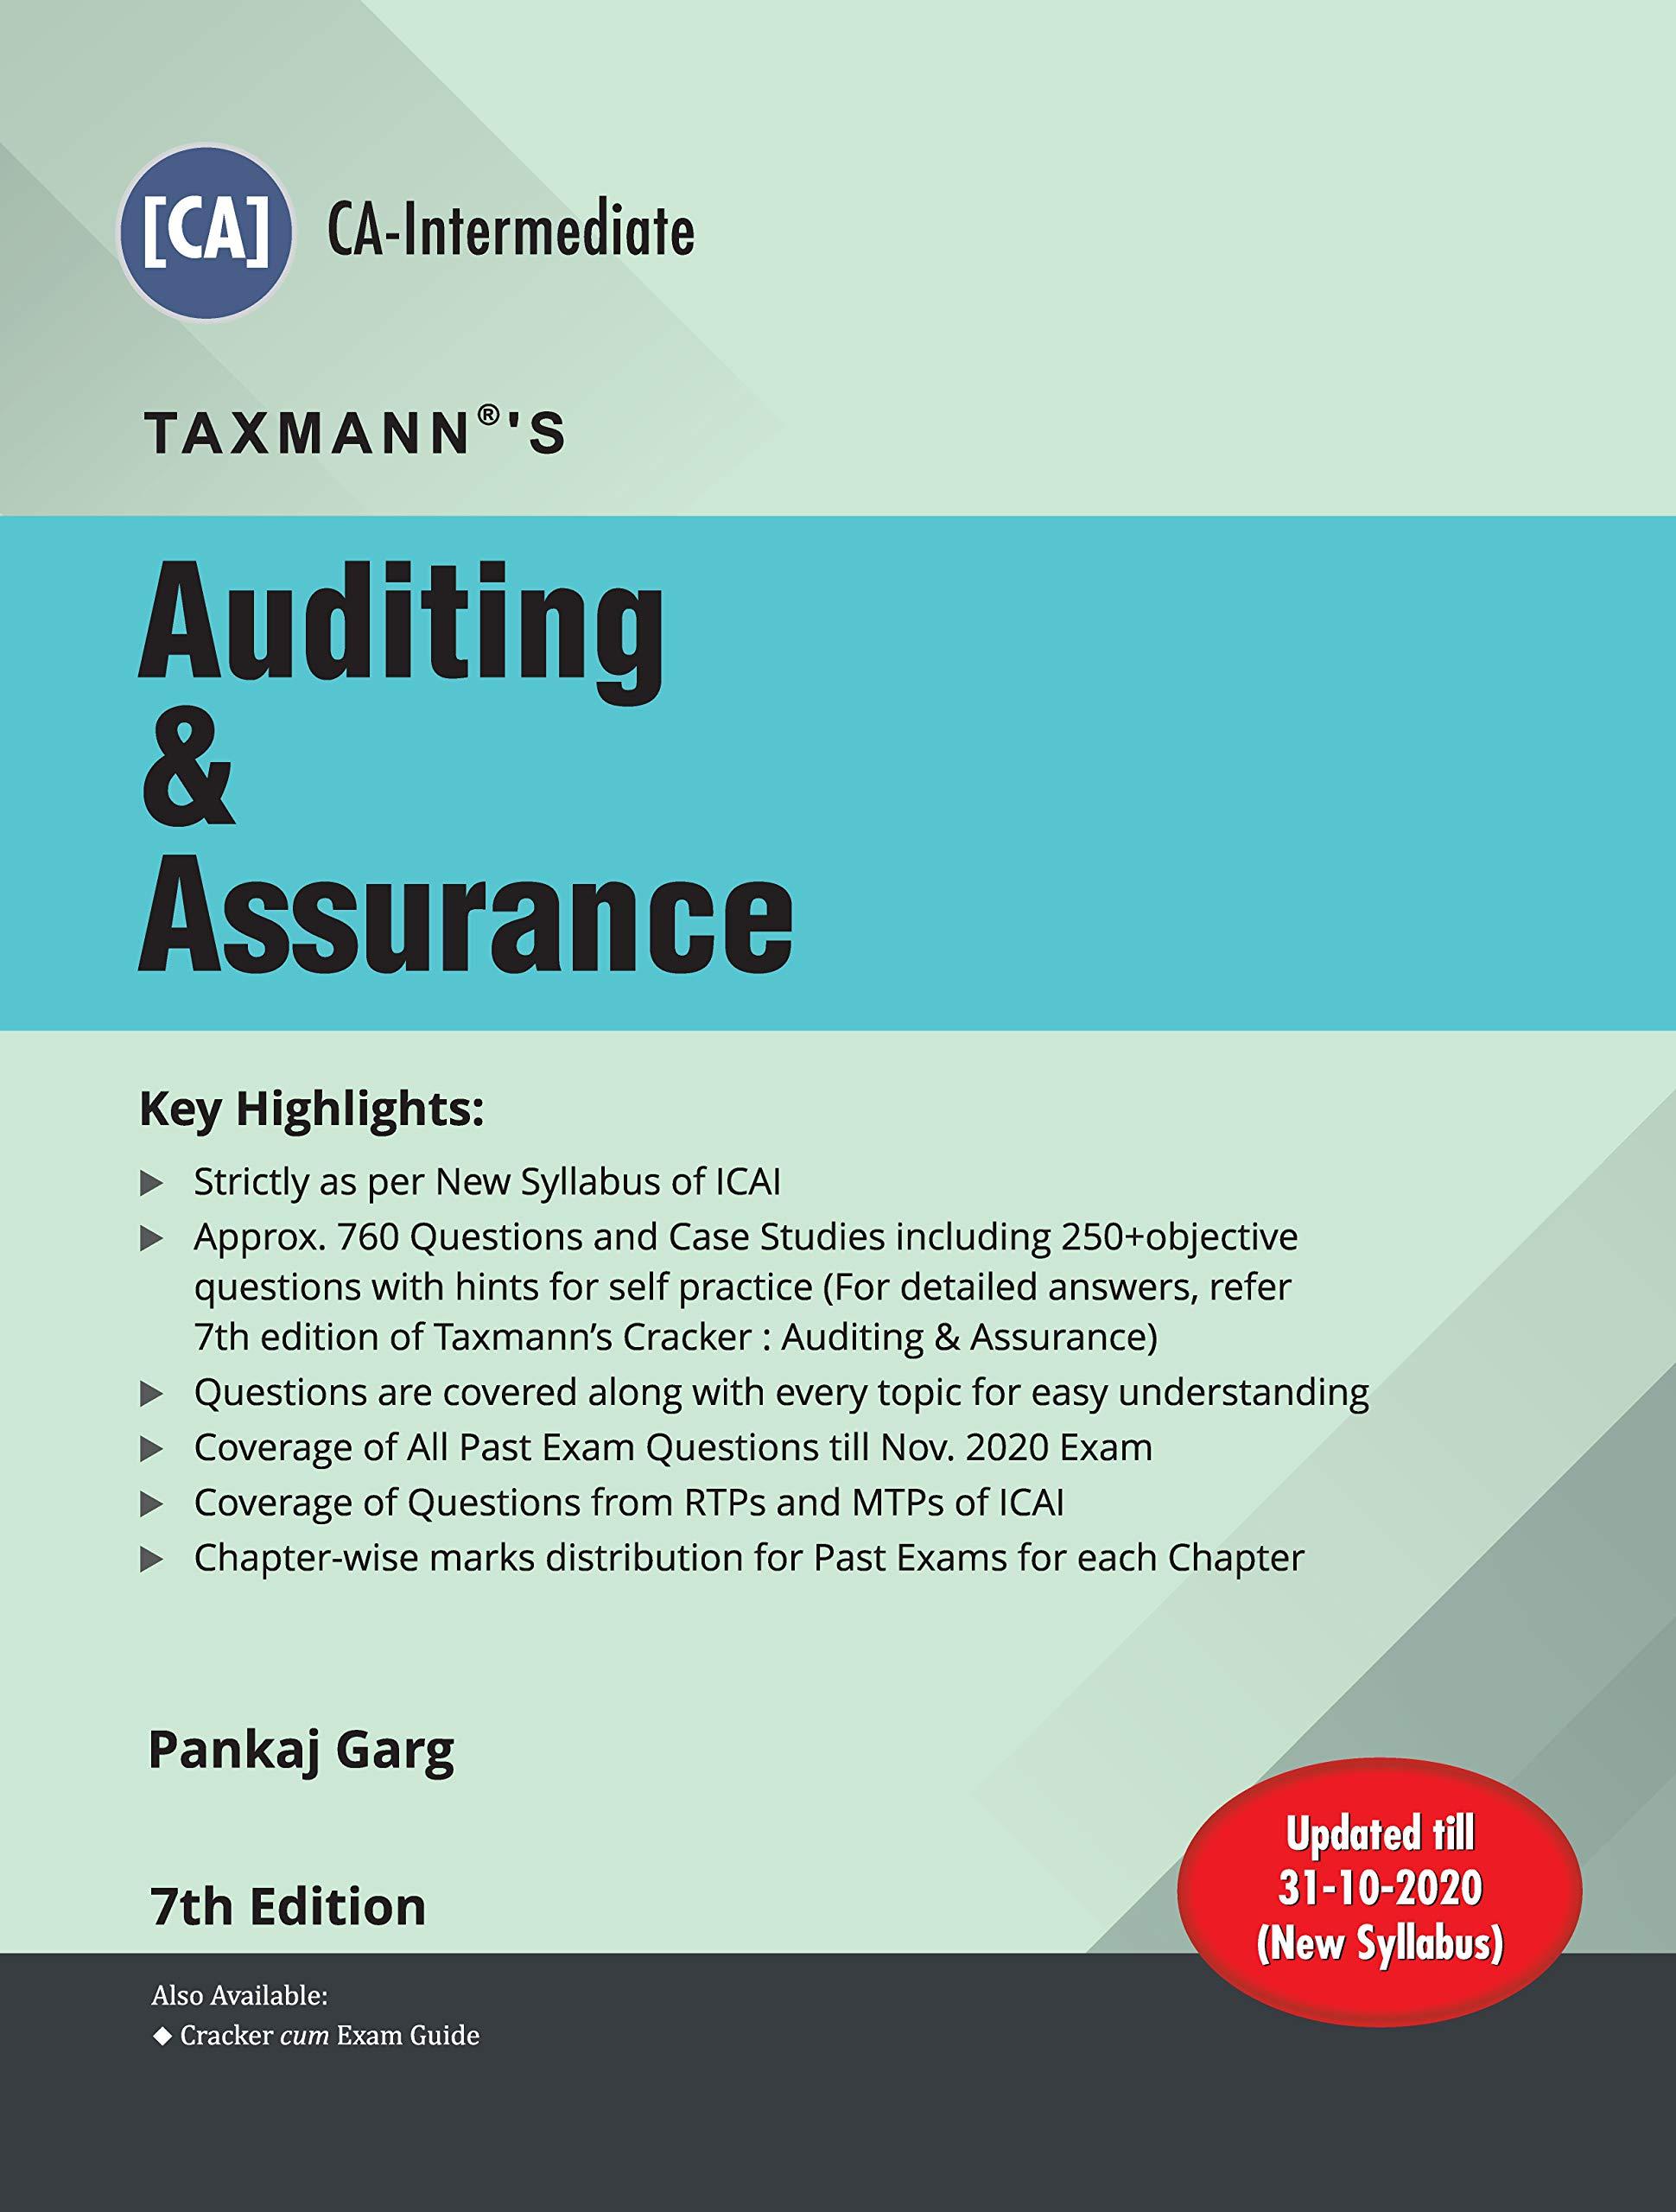 Taxmann's Auditing & Assurance   CA-Intermediate – New Syllabus   Updated till 31-10-2020   7th Edition   2021